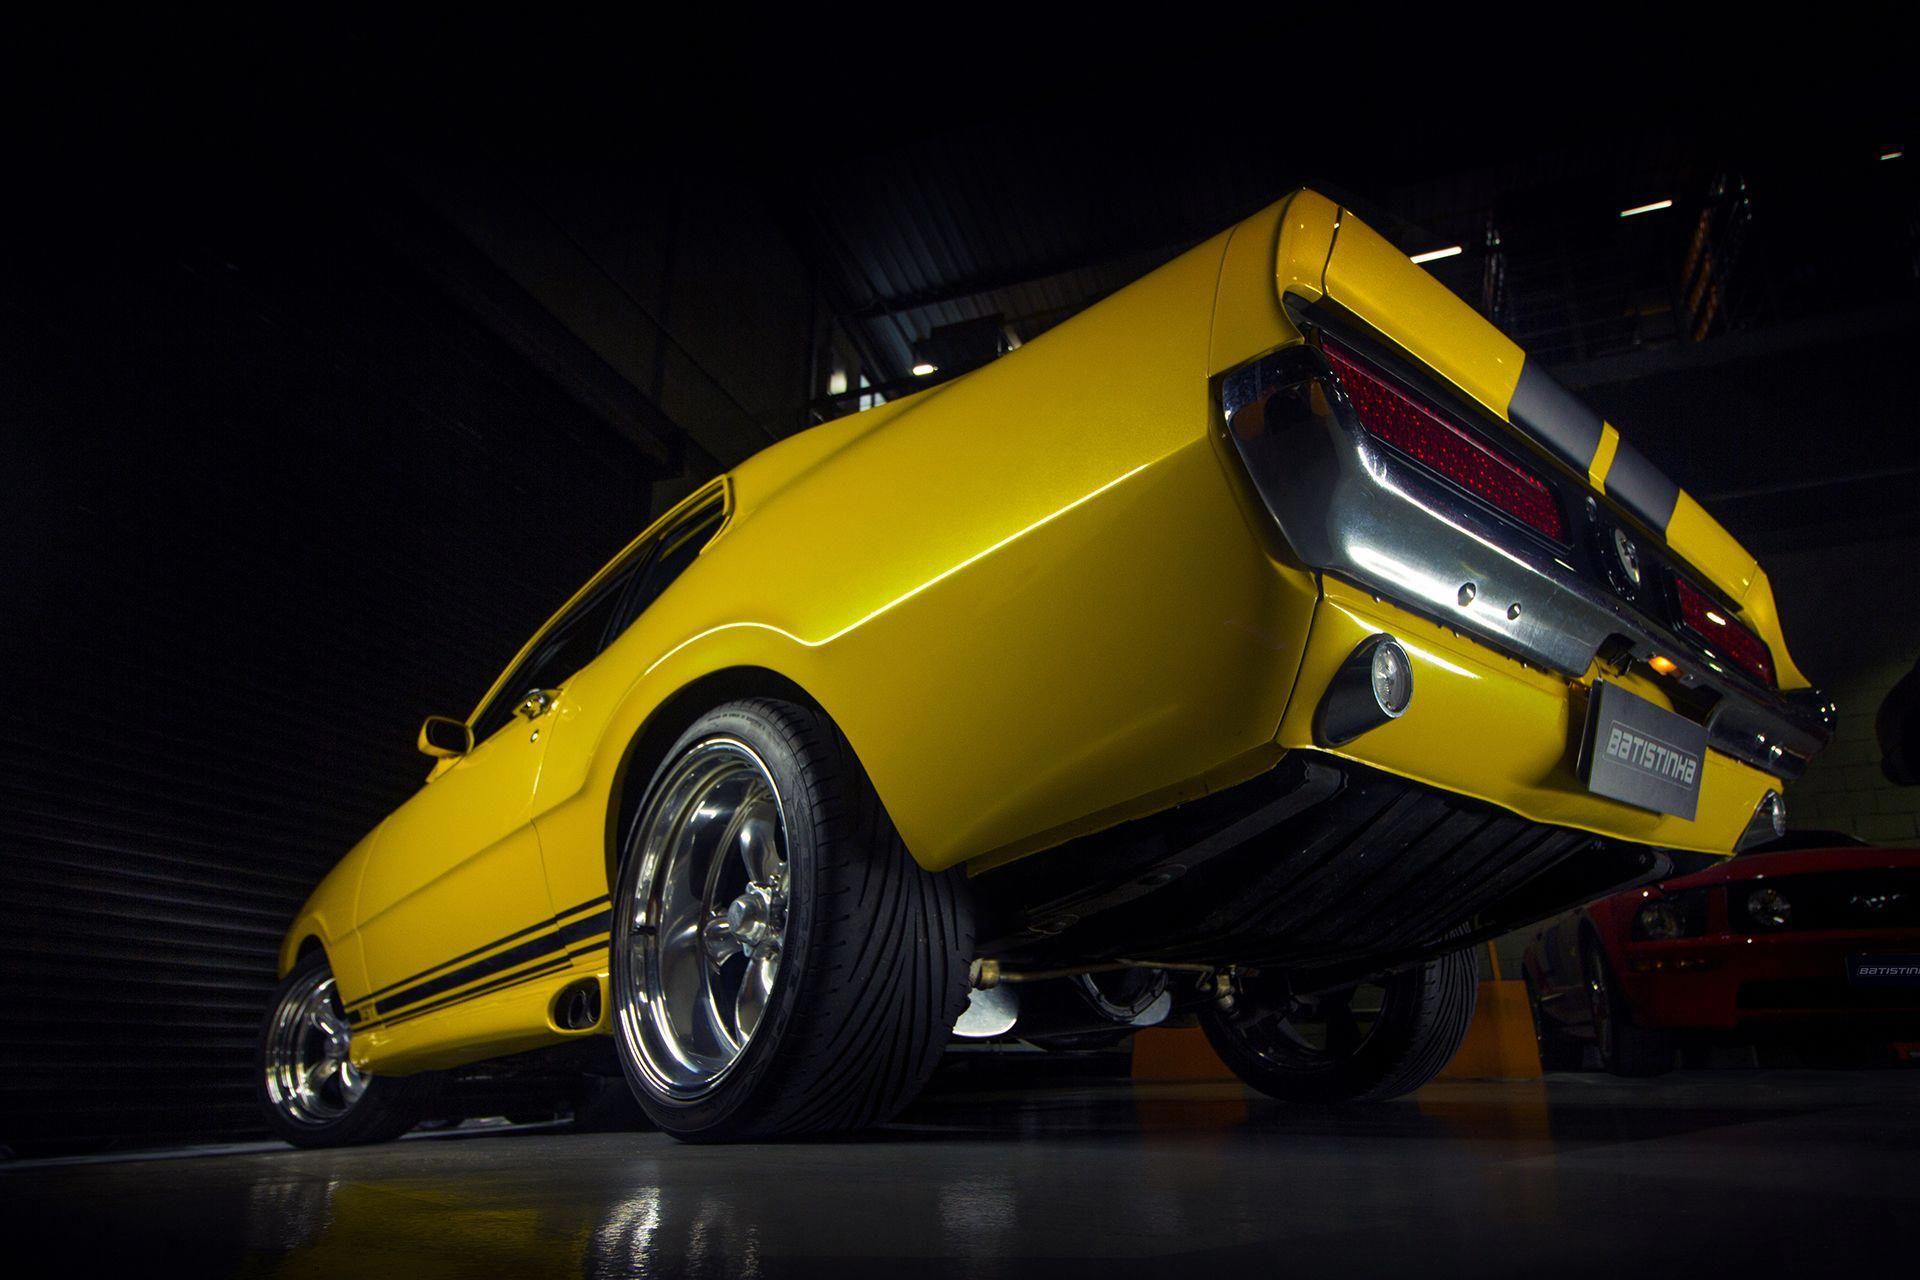 Maverick Gt Rexona V8 Led Rearlights Gt500 Style Svo Sideskirts Torque Thrust Wheels L L Batistinha Mave Ford Maverick Classic Cars Muscle Muscle Cars